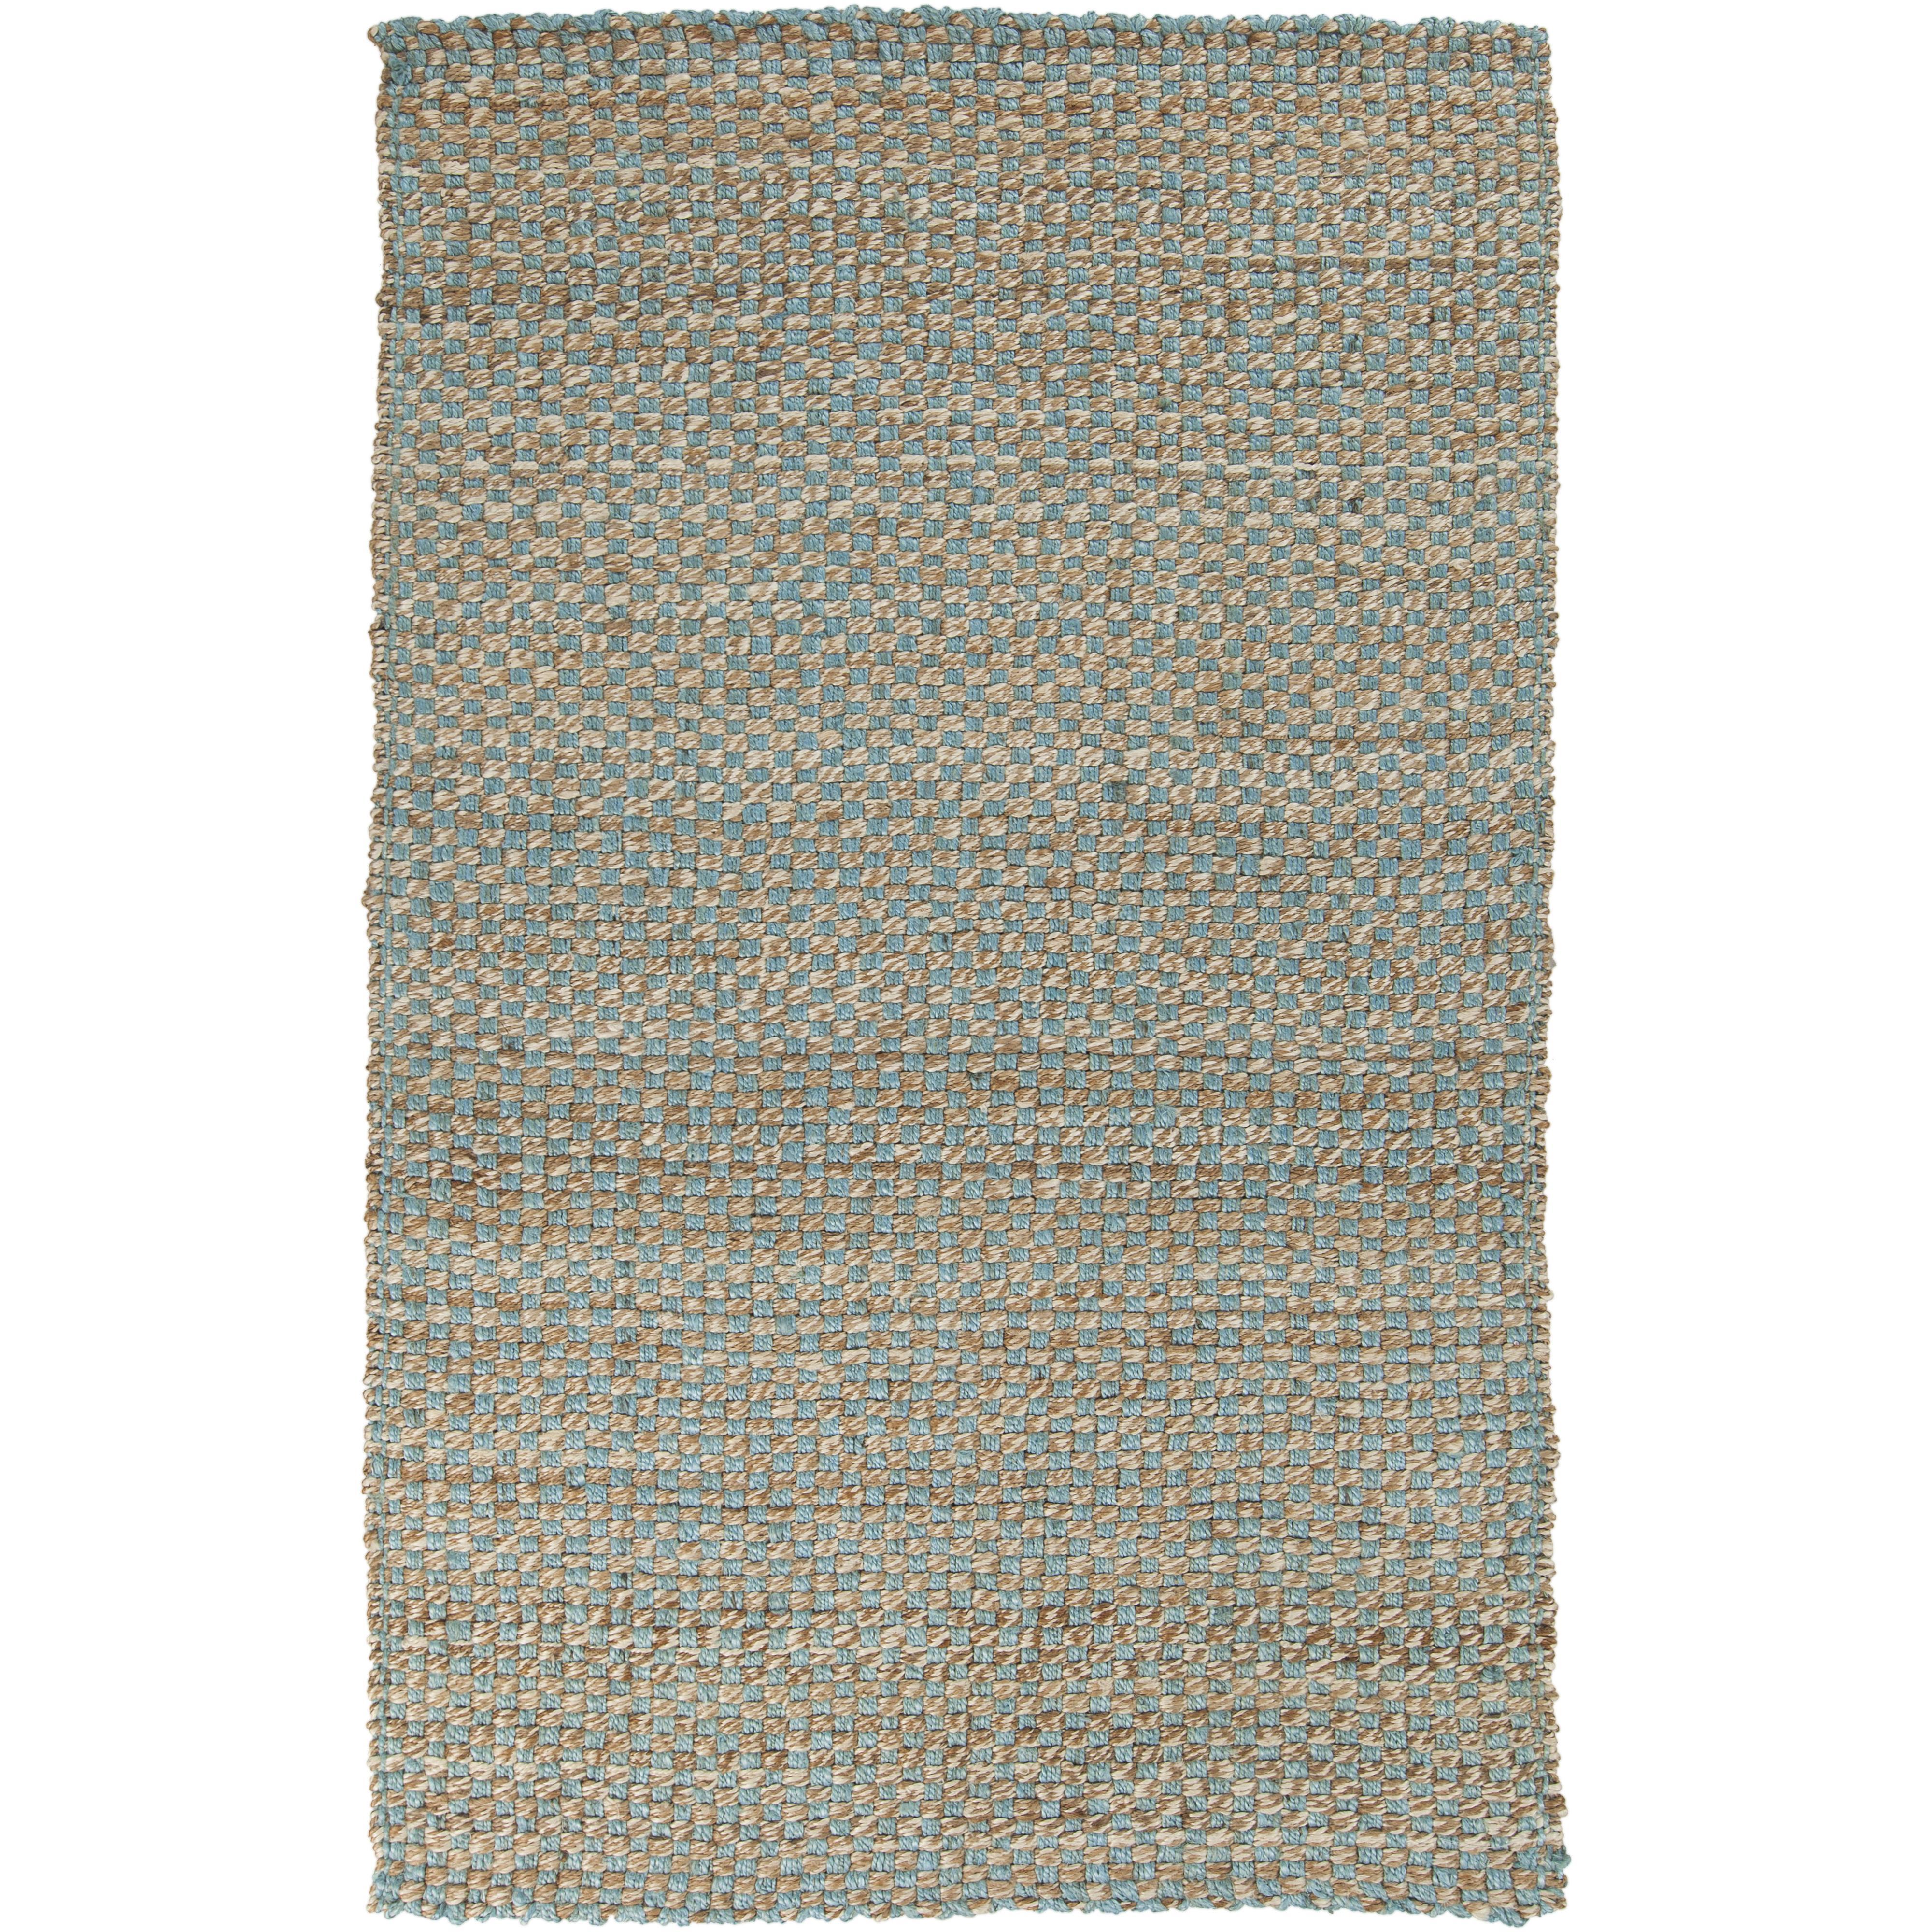 Surya Reeds 10' x 14' - Item Number: REED823-1014